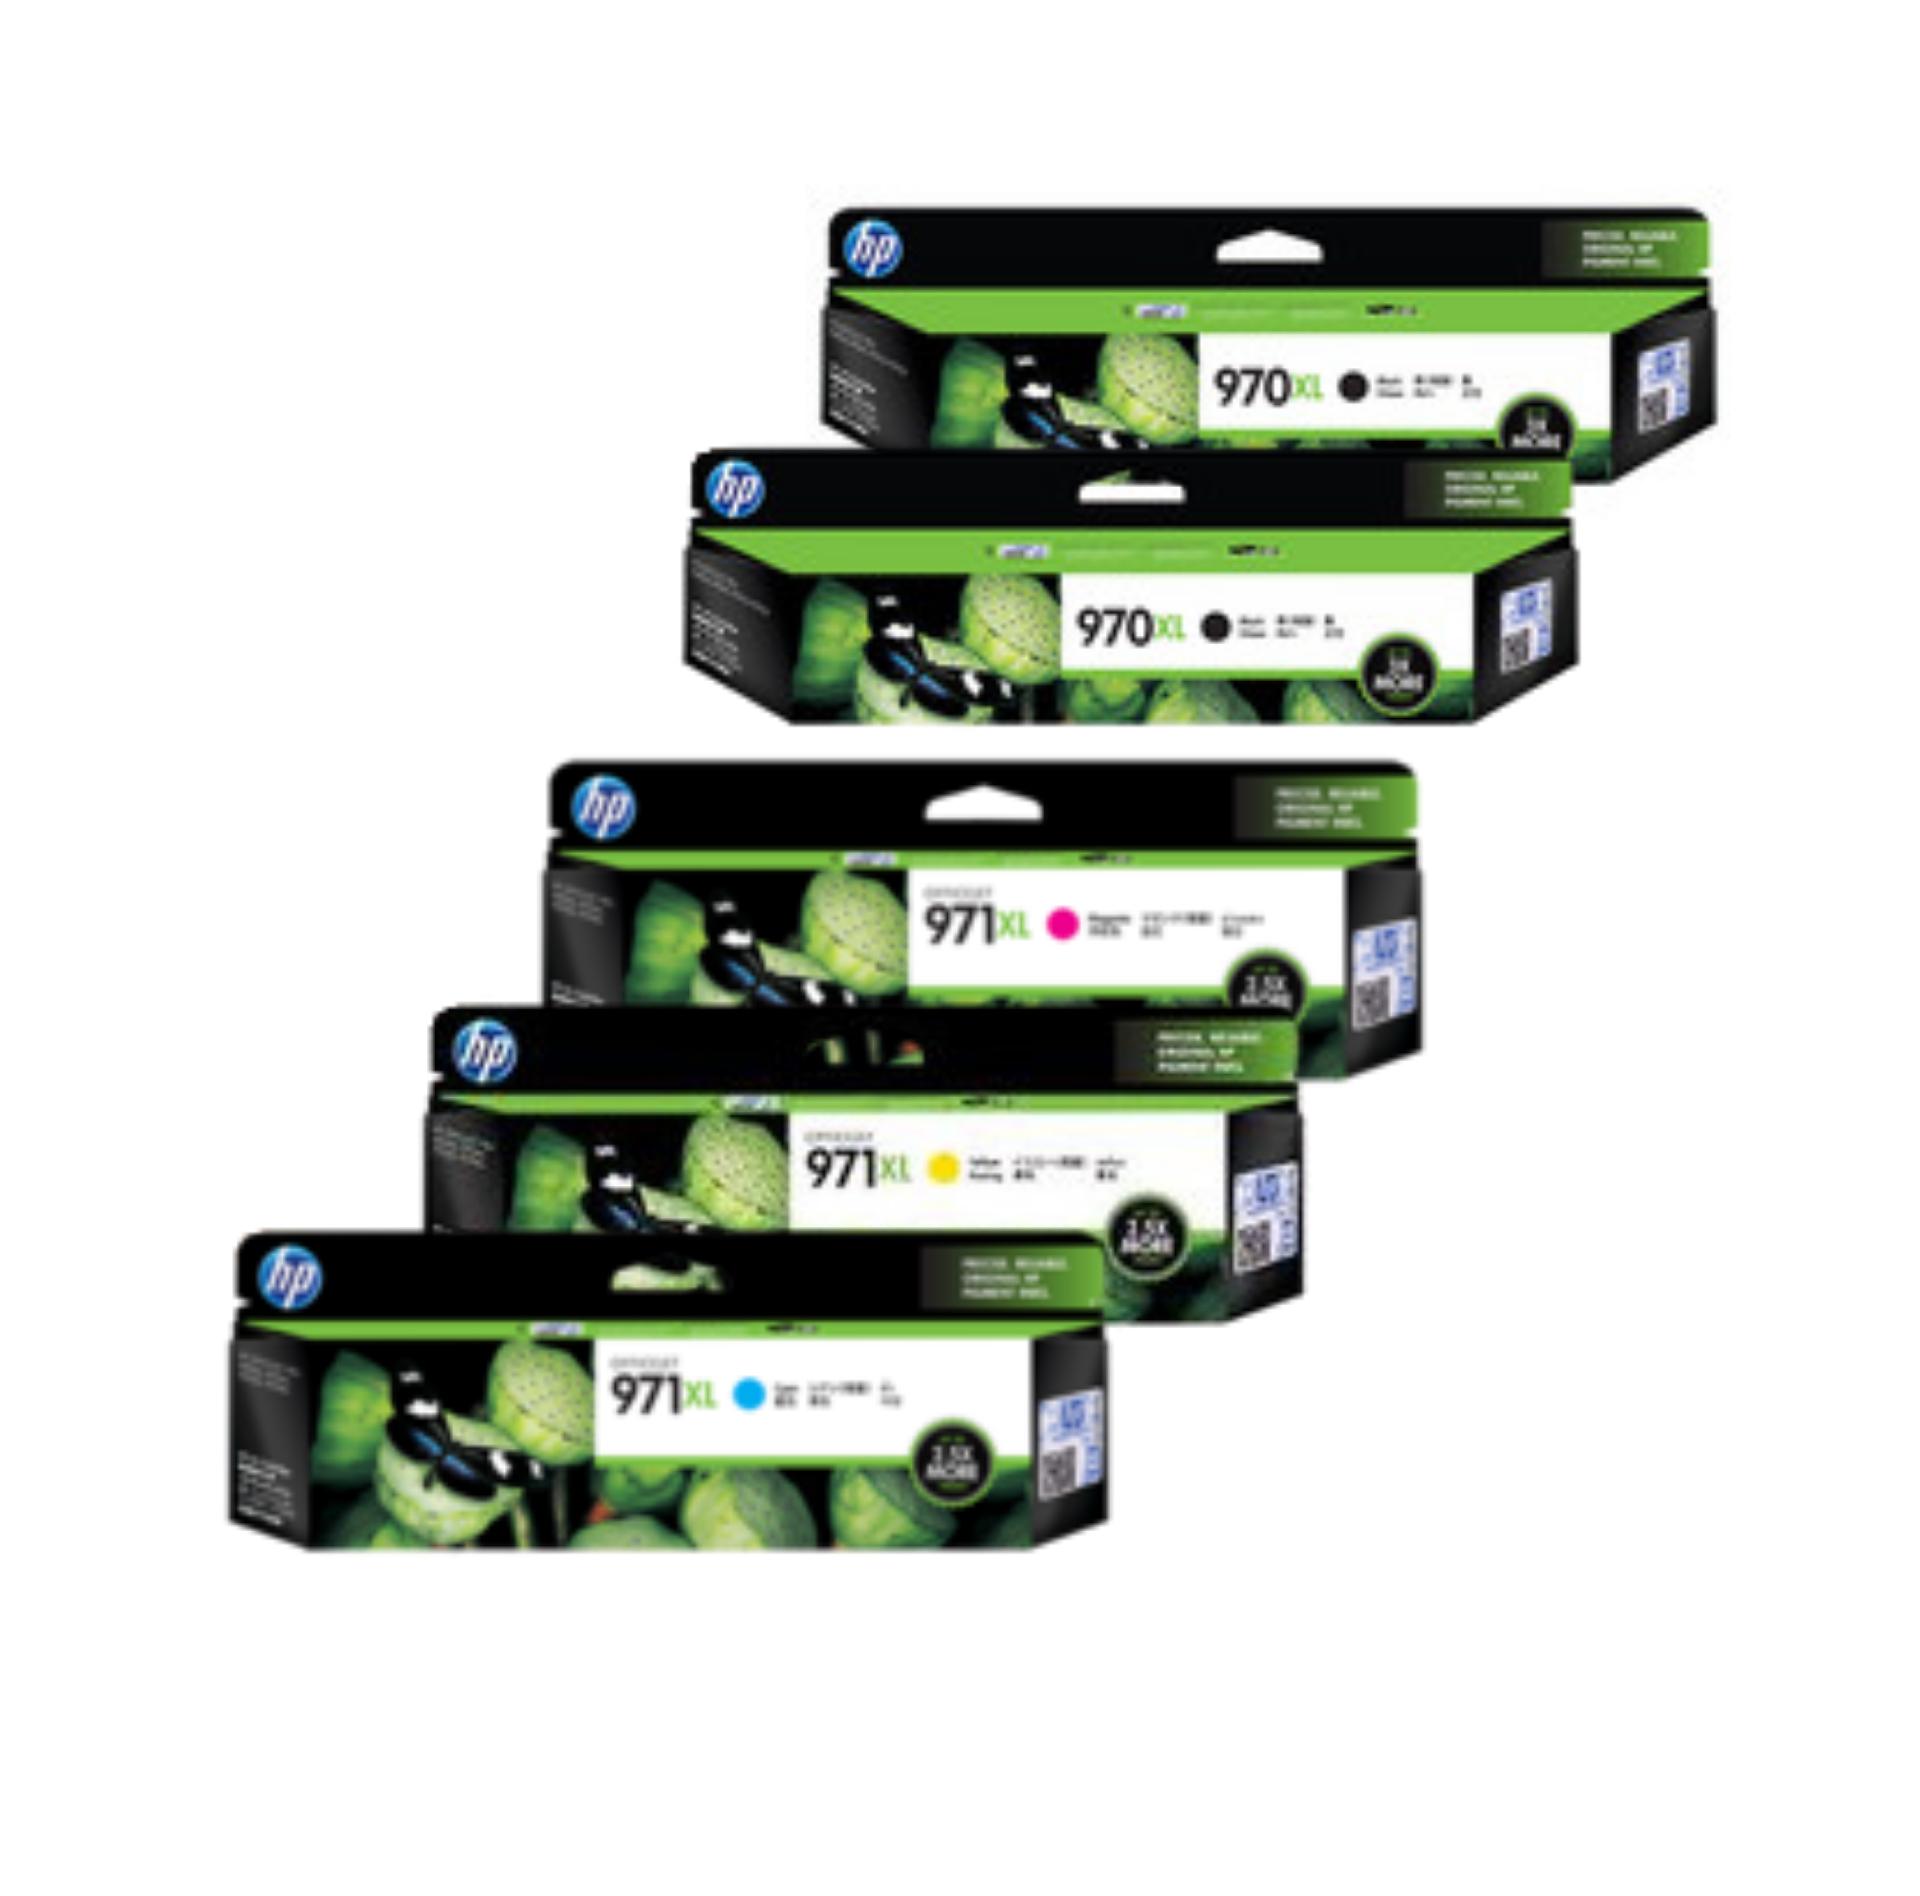 HP 970XL, 971XL Ink Cartridge Value Pack - Includes: [2 x Black, 1 x Cyan, Magenta, Yellow]